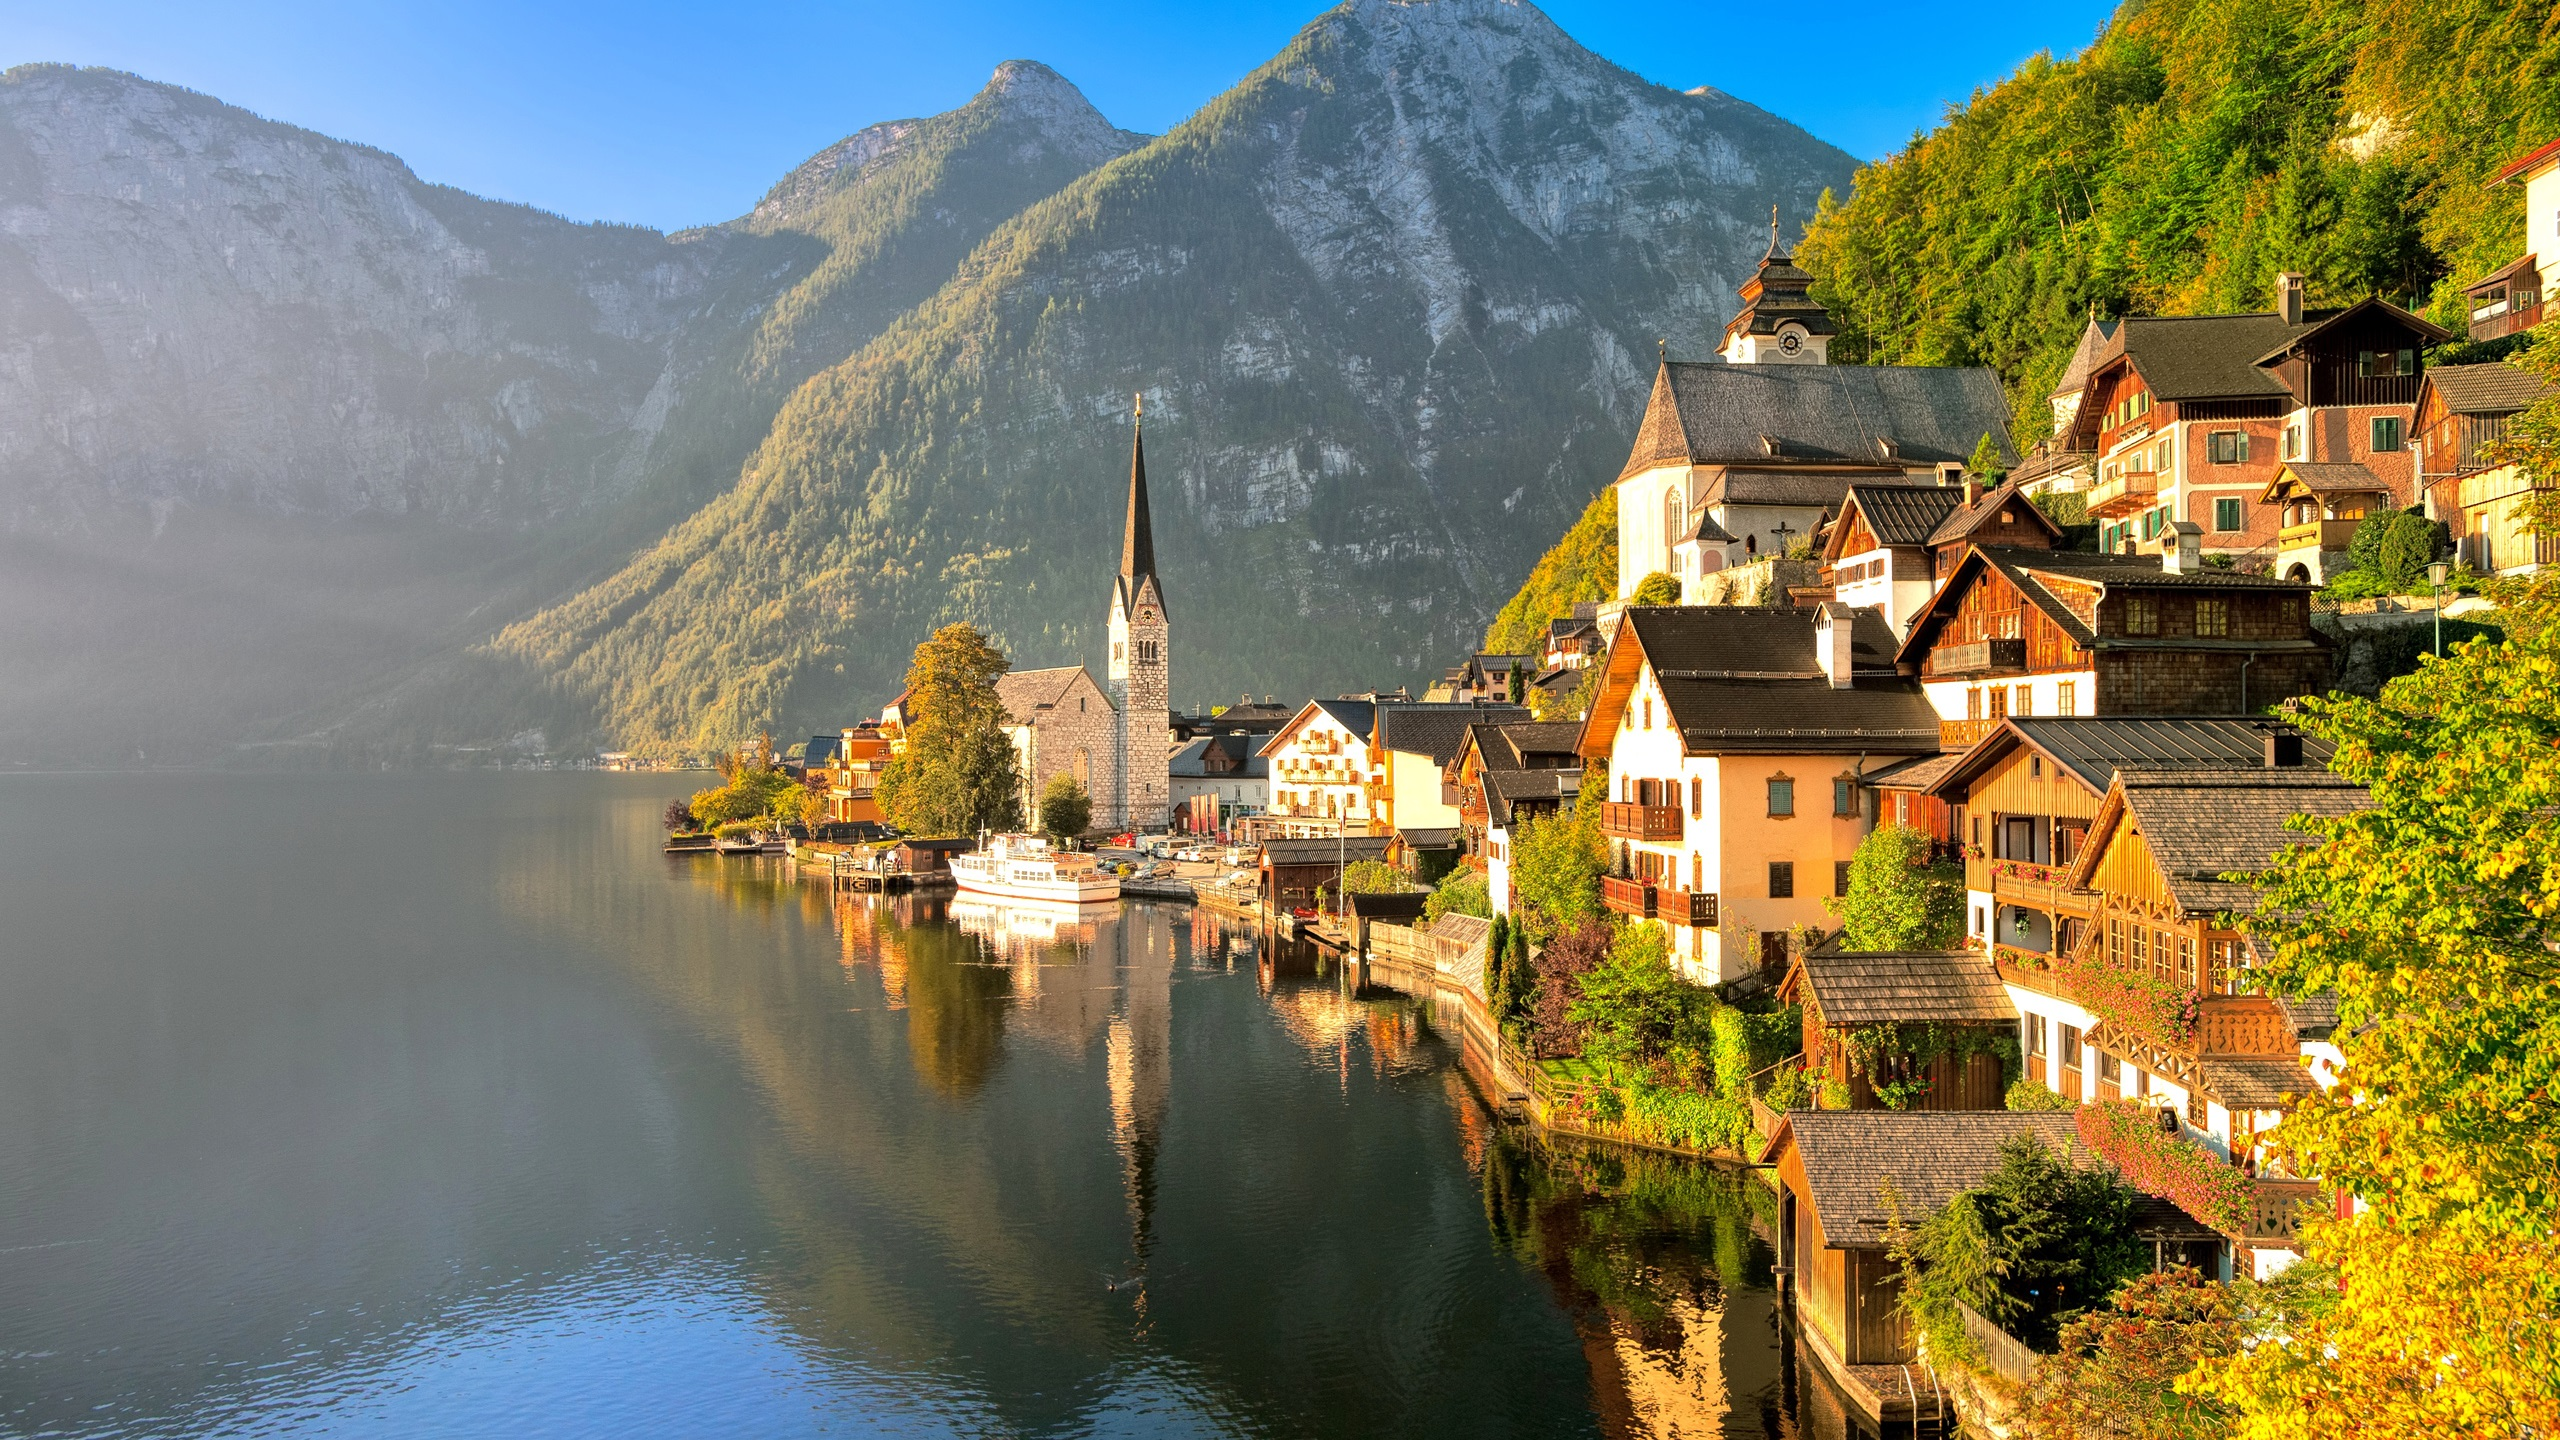 Wallpaper Austria, Hallstatt, Salzkammergut, autumn, house, lake,  mountains, sunlight 2560x1600 HD Picture, Image